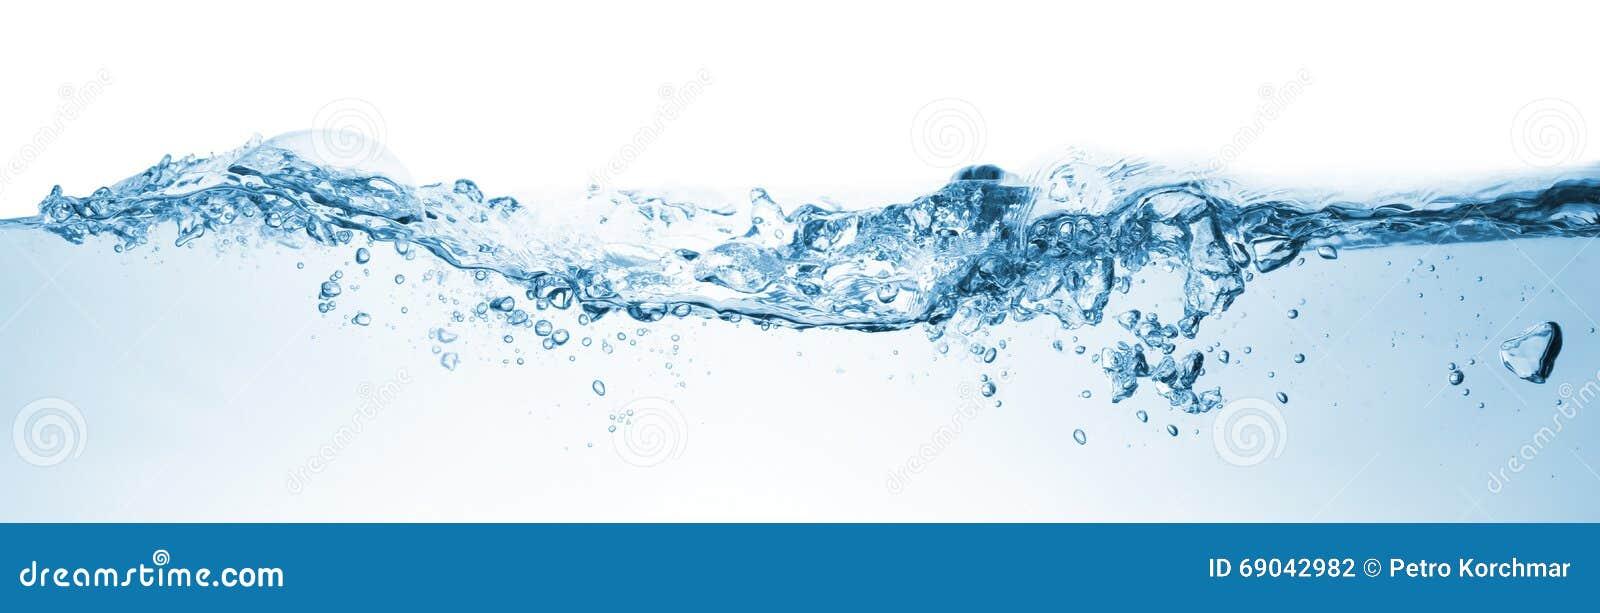 Wave. Water splashing over white background